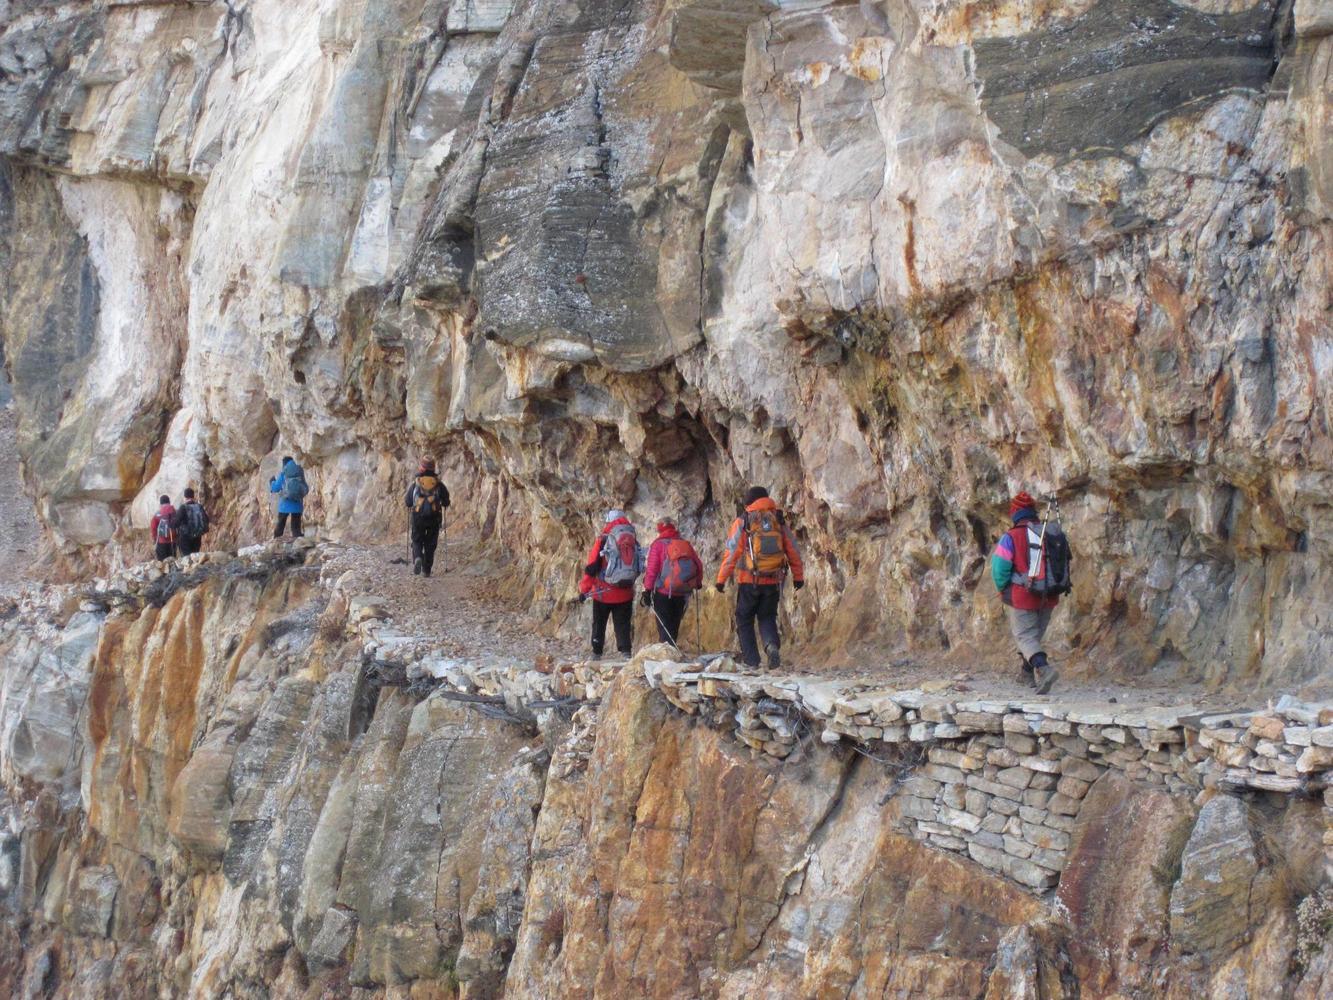 Vers Phu, Nepal - Jean-Luc Moreau